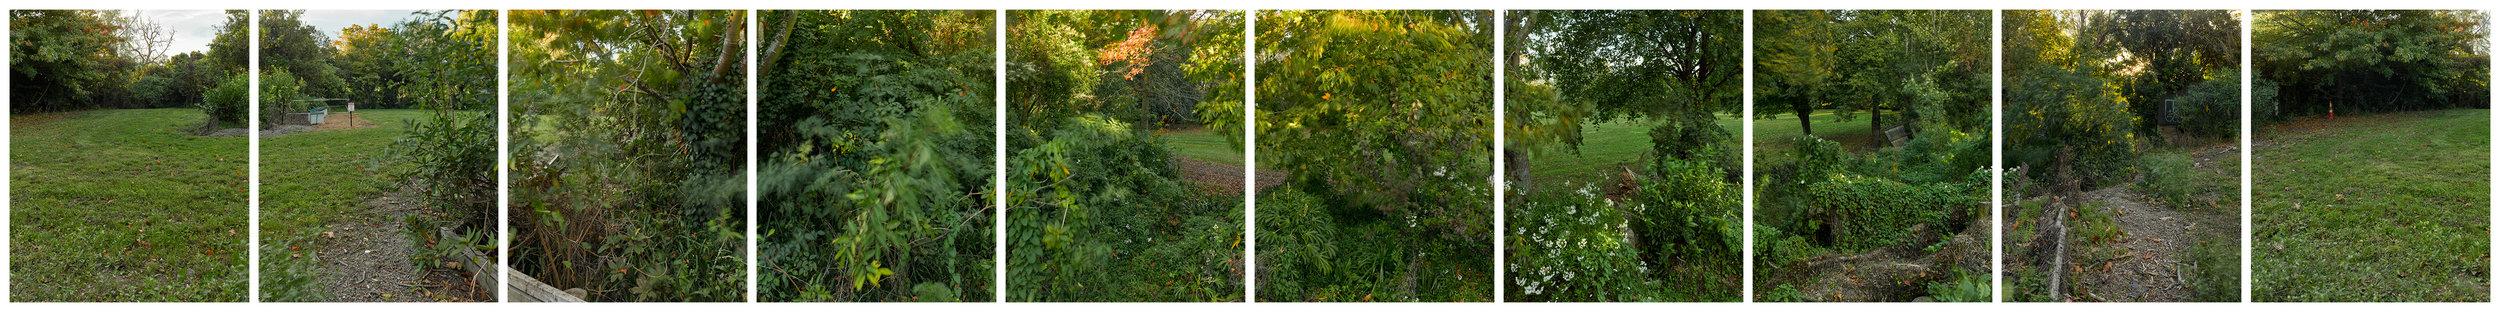 Banks Avenue, Richmond/Avonside, 360 degree panorama.